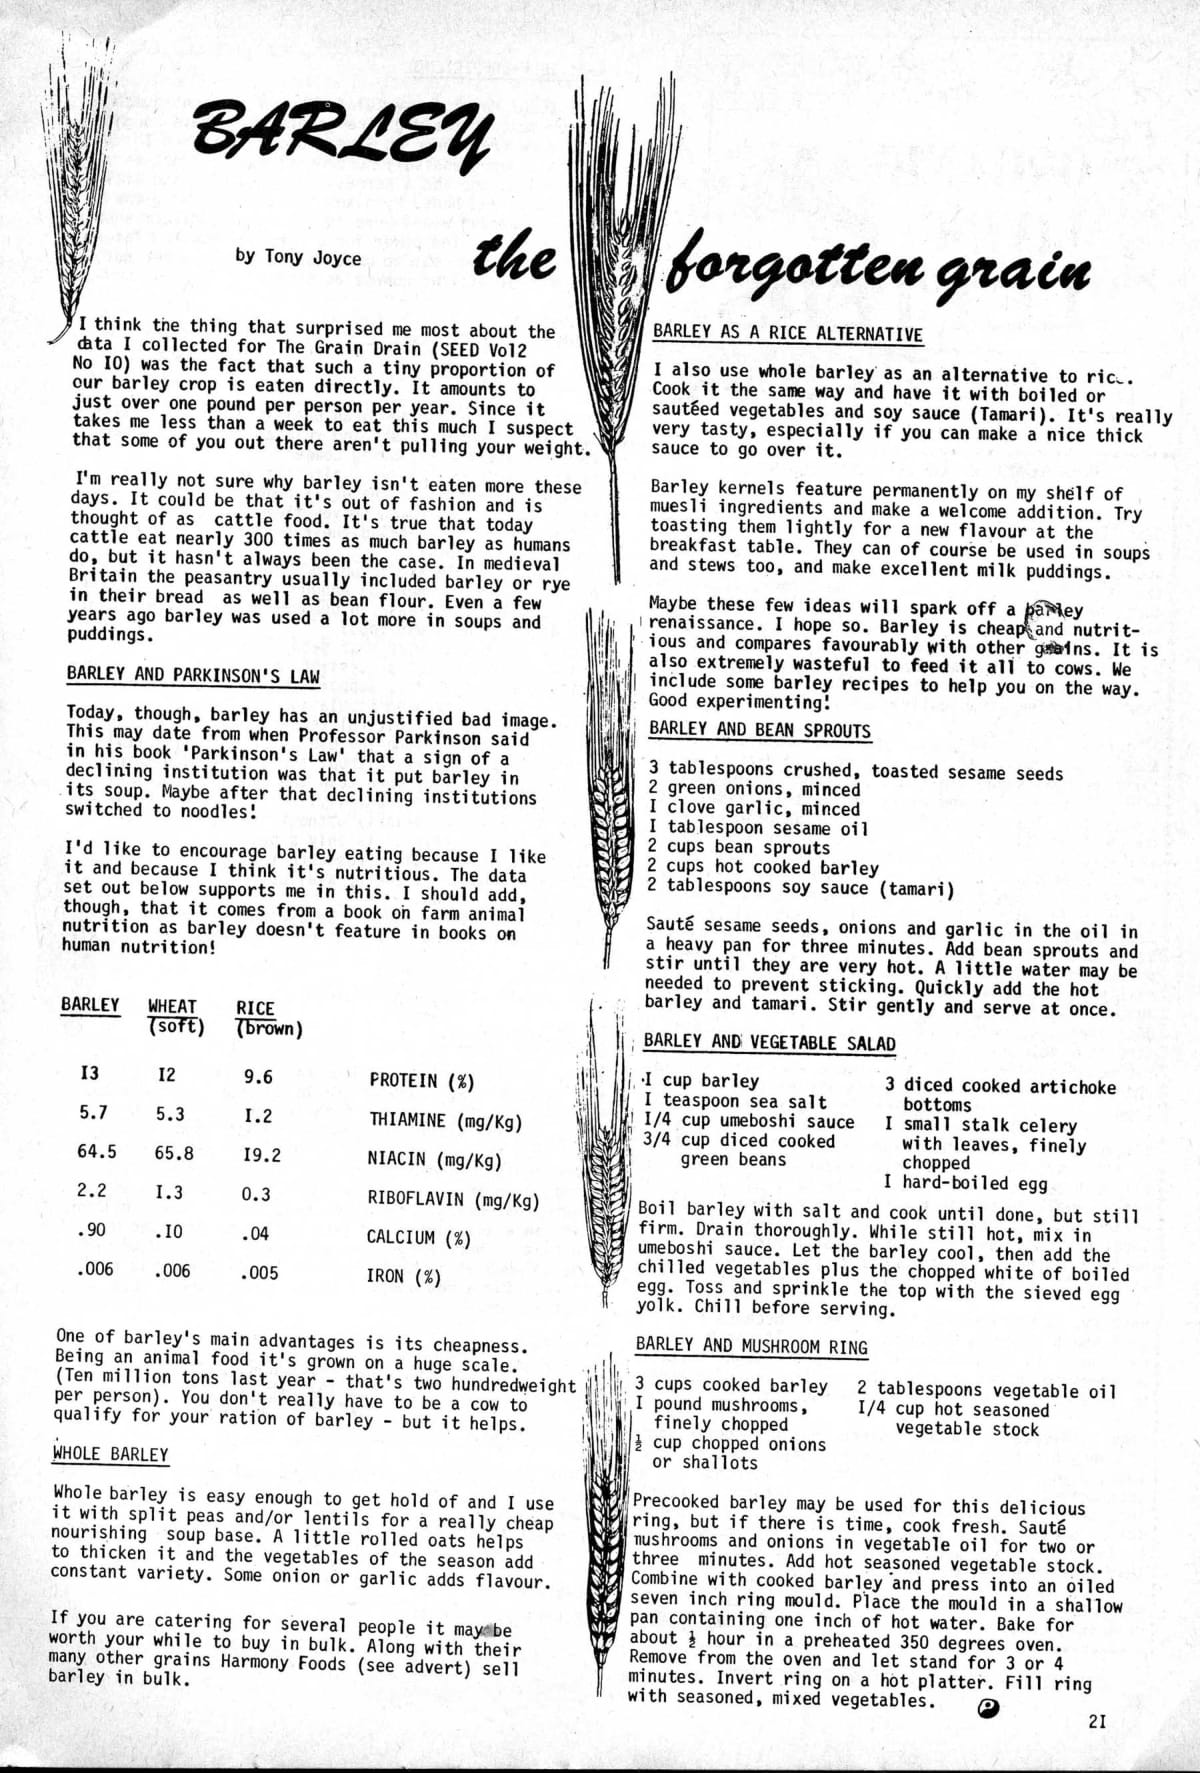 seed-v3-n4-april1974-21.jpg